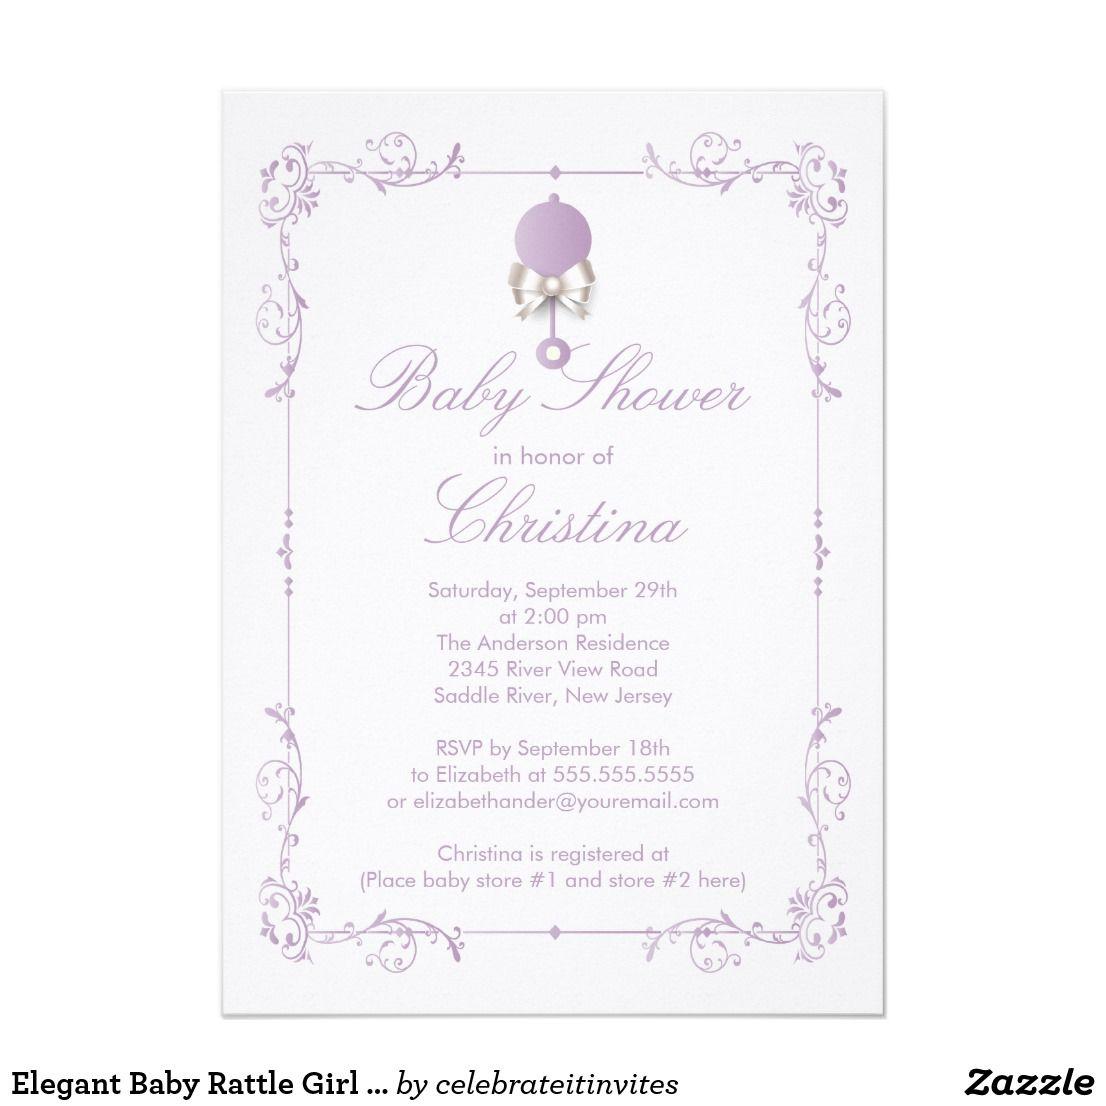 Elegant Baby Rattle Girl Baby Shower Invitation | Shower invitations